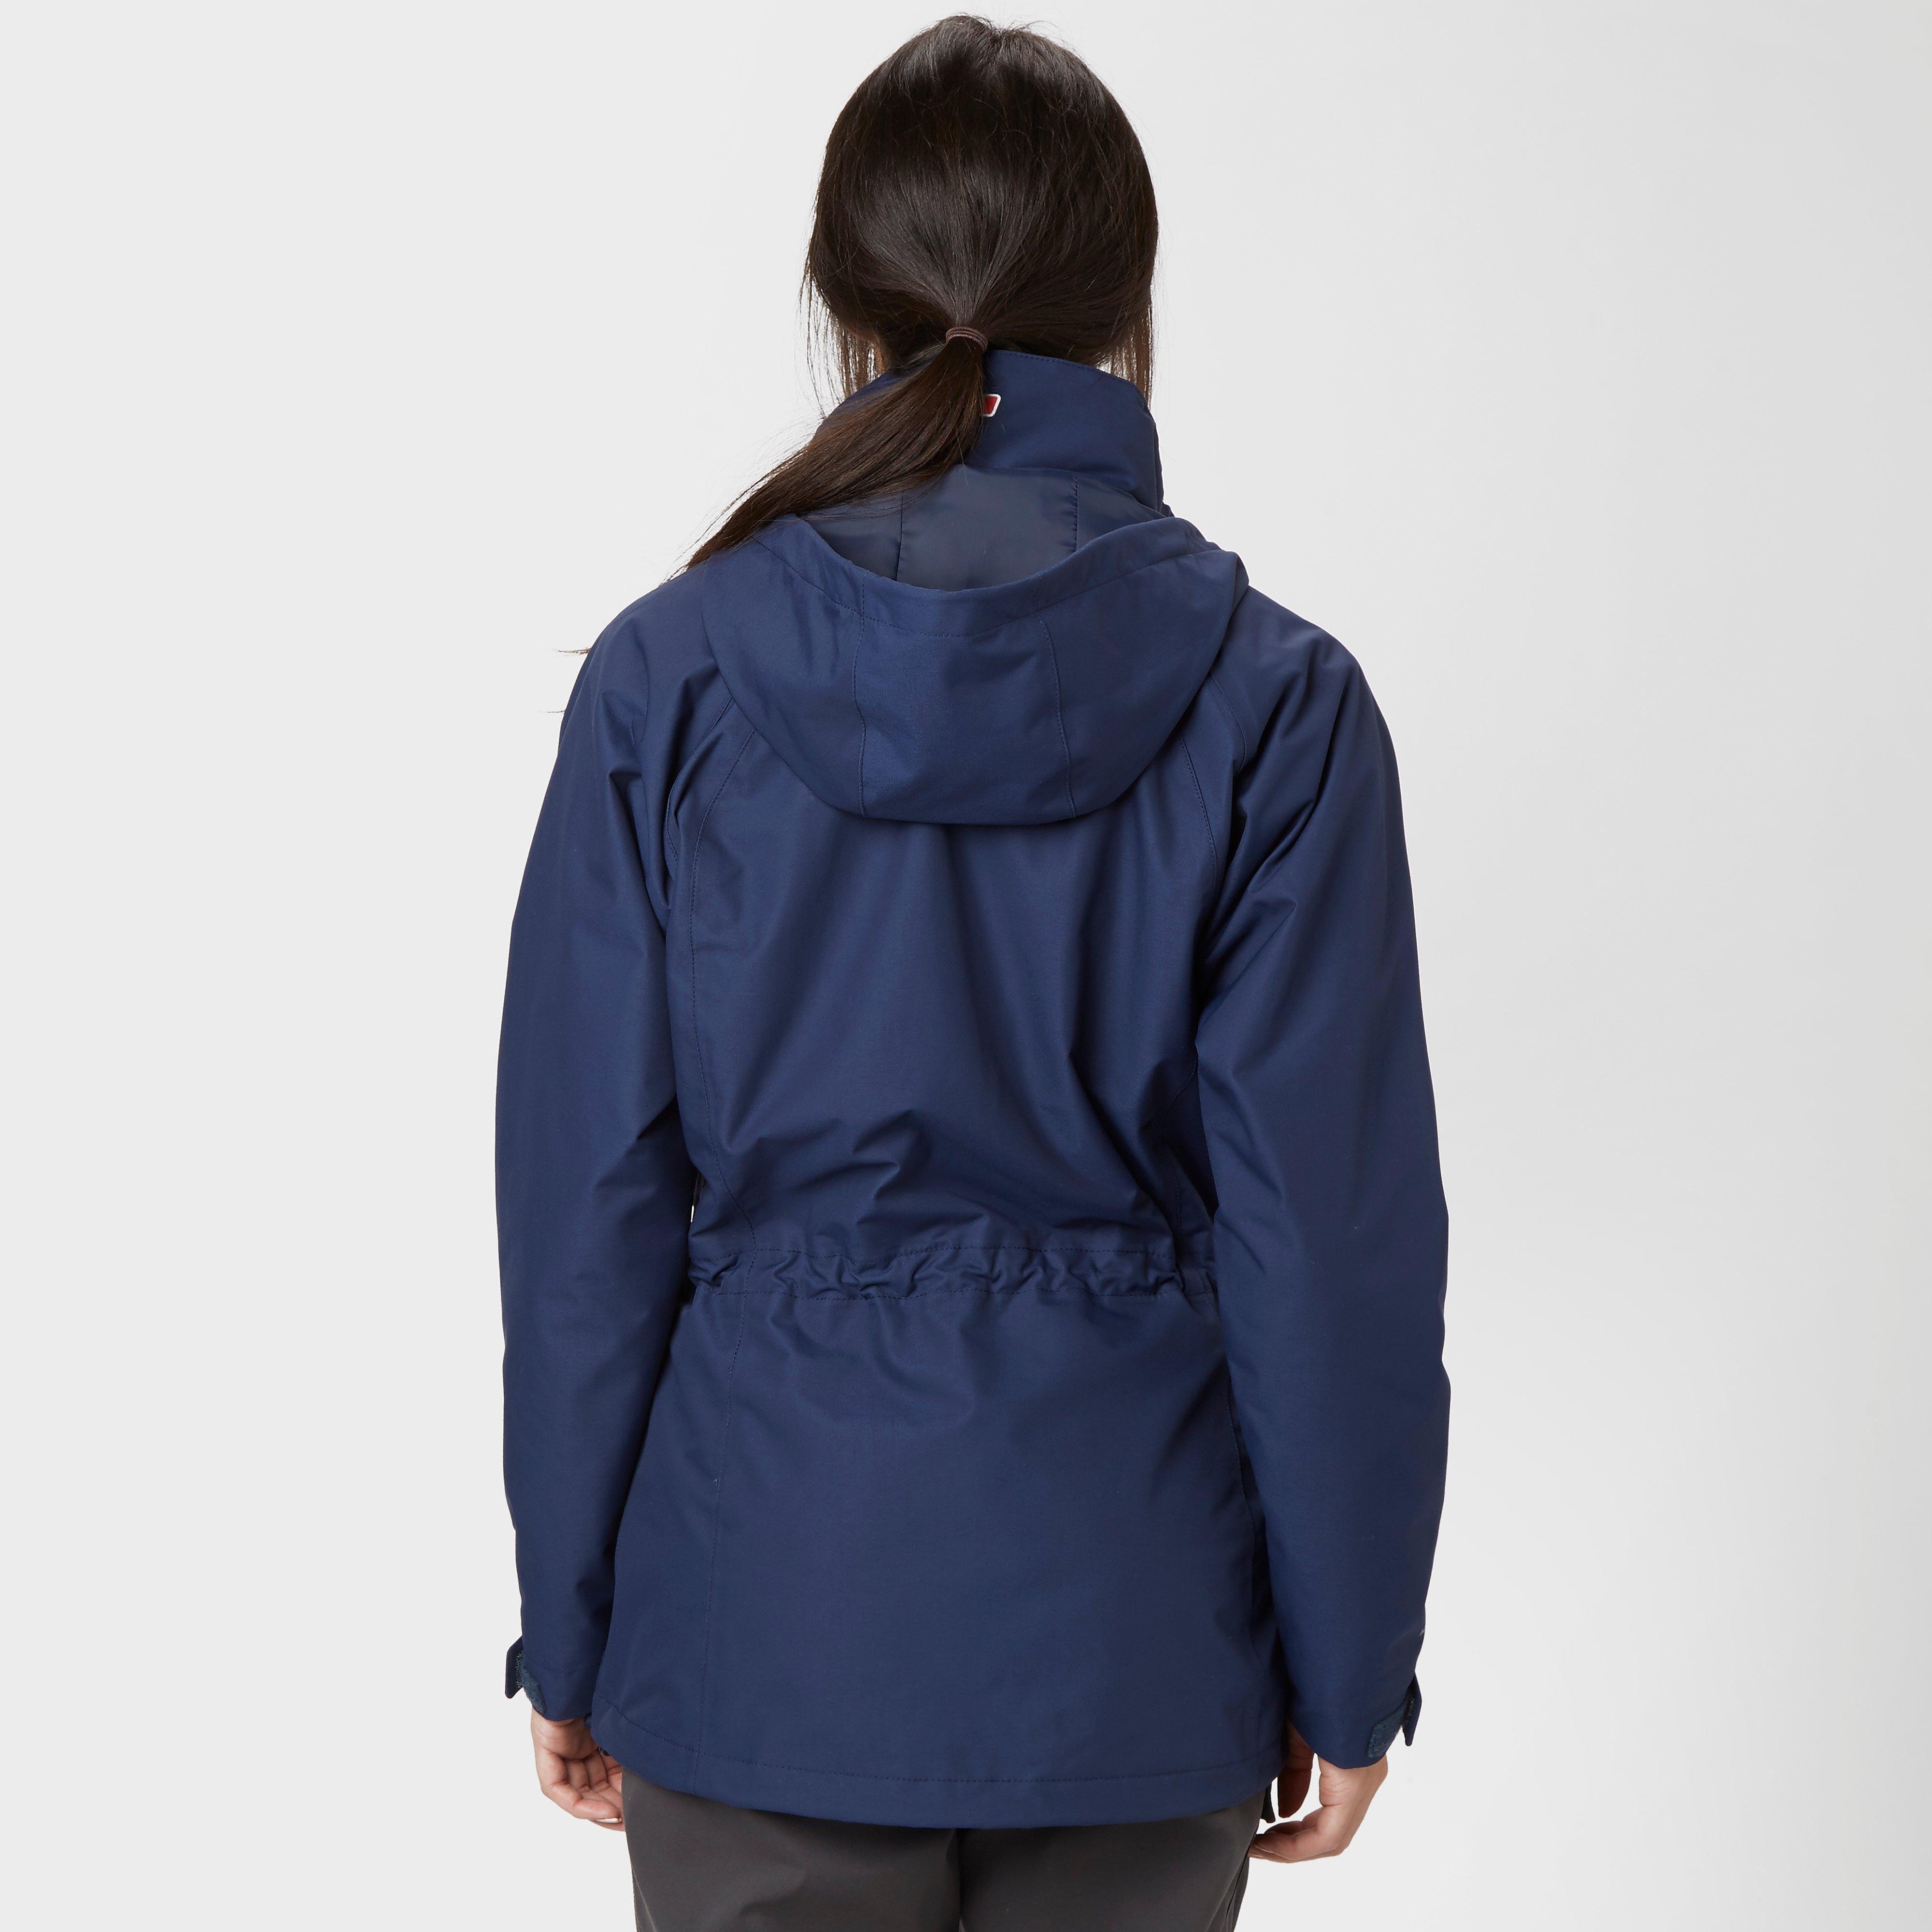 Berghaus Rosgill 3-in-1 Waterproof Women's Jacket